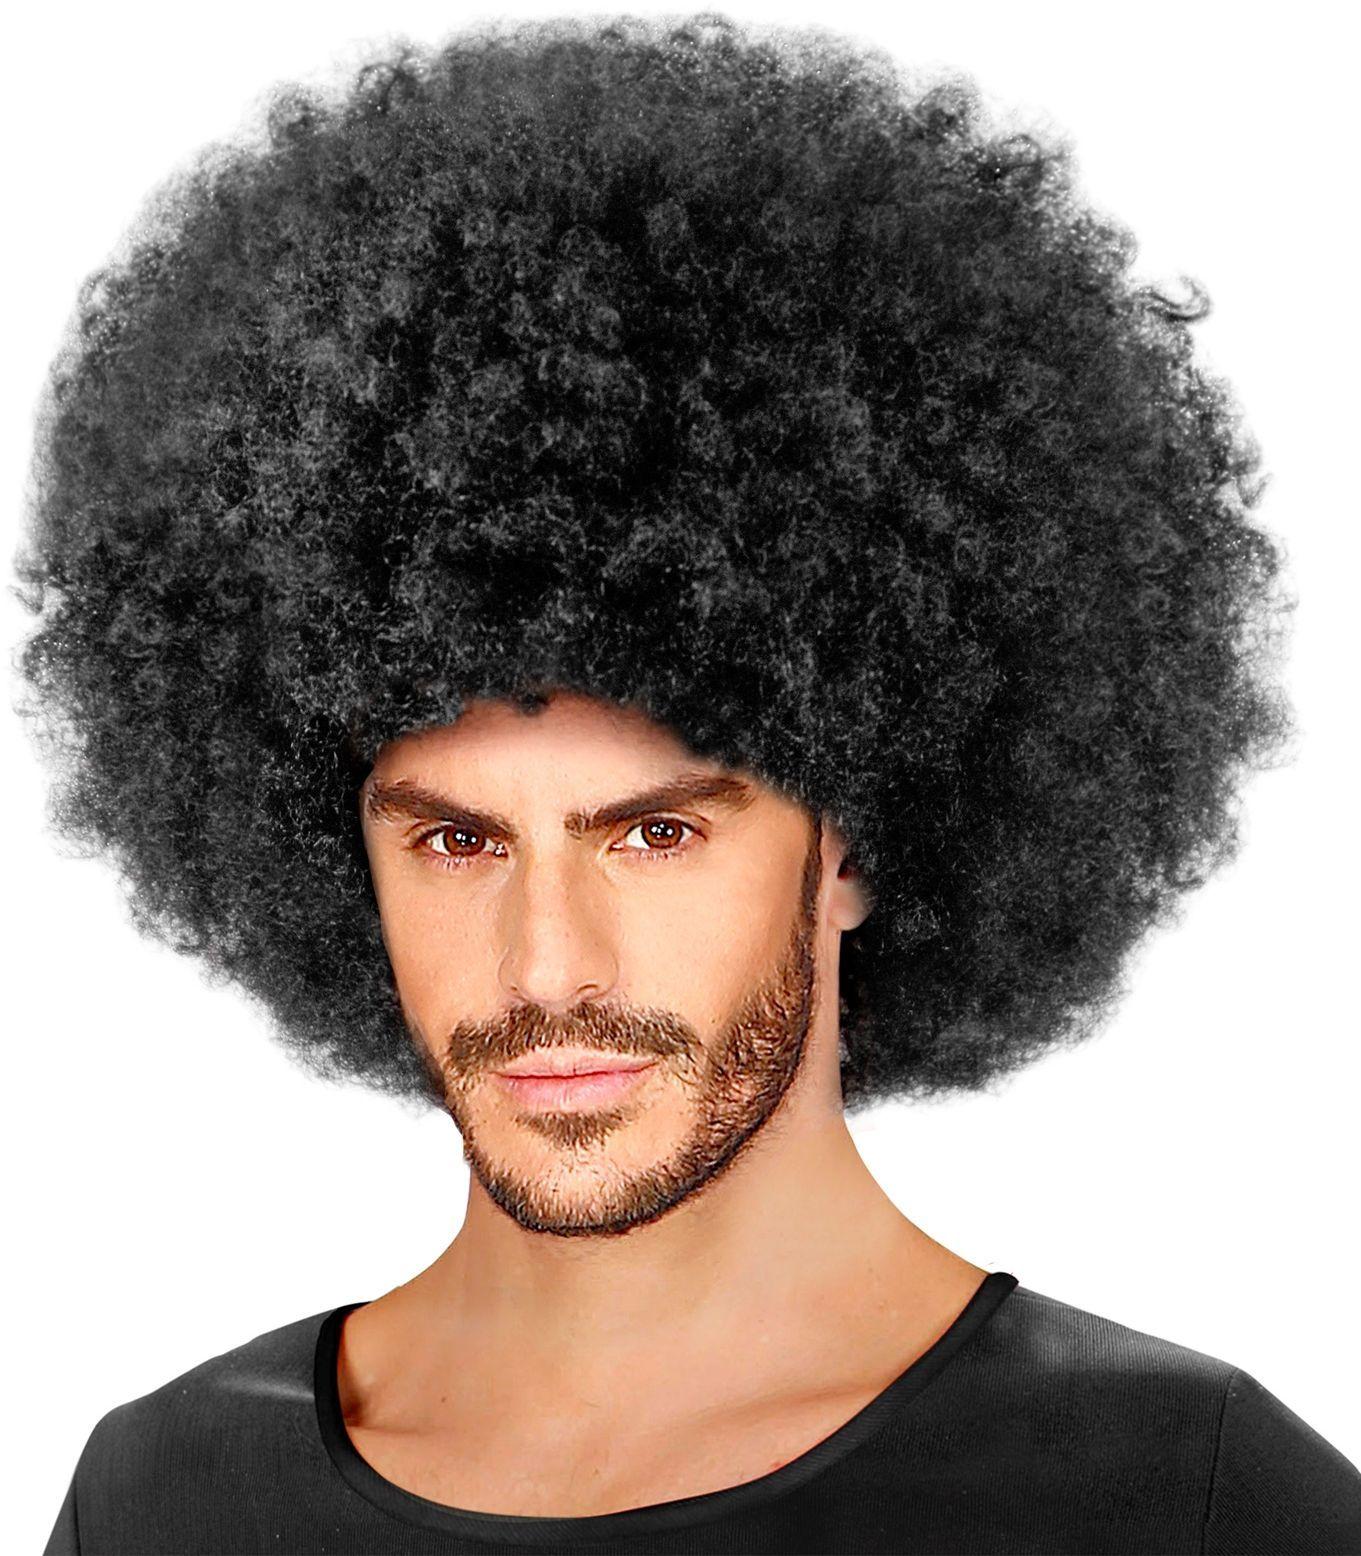 Zwarte gekrulde afro pruik